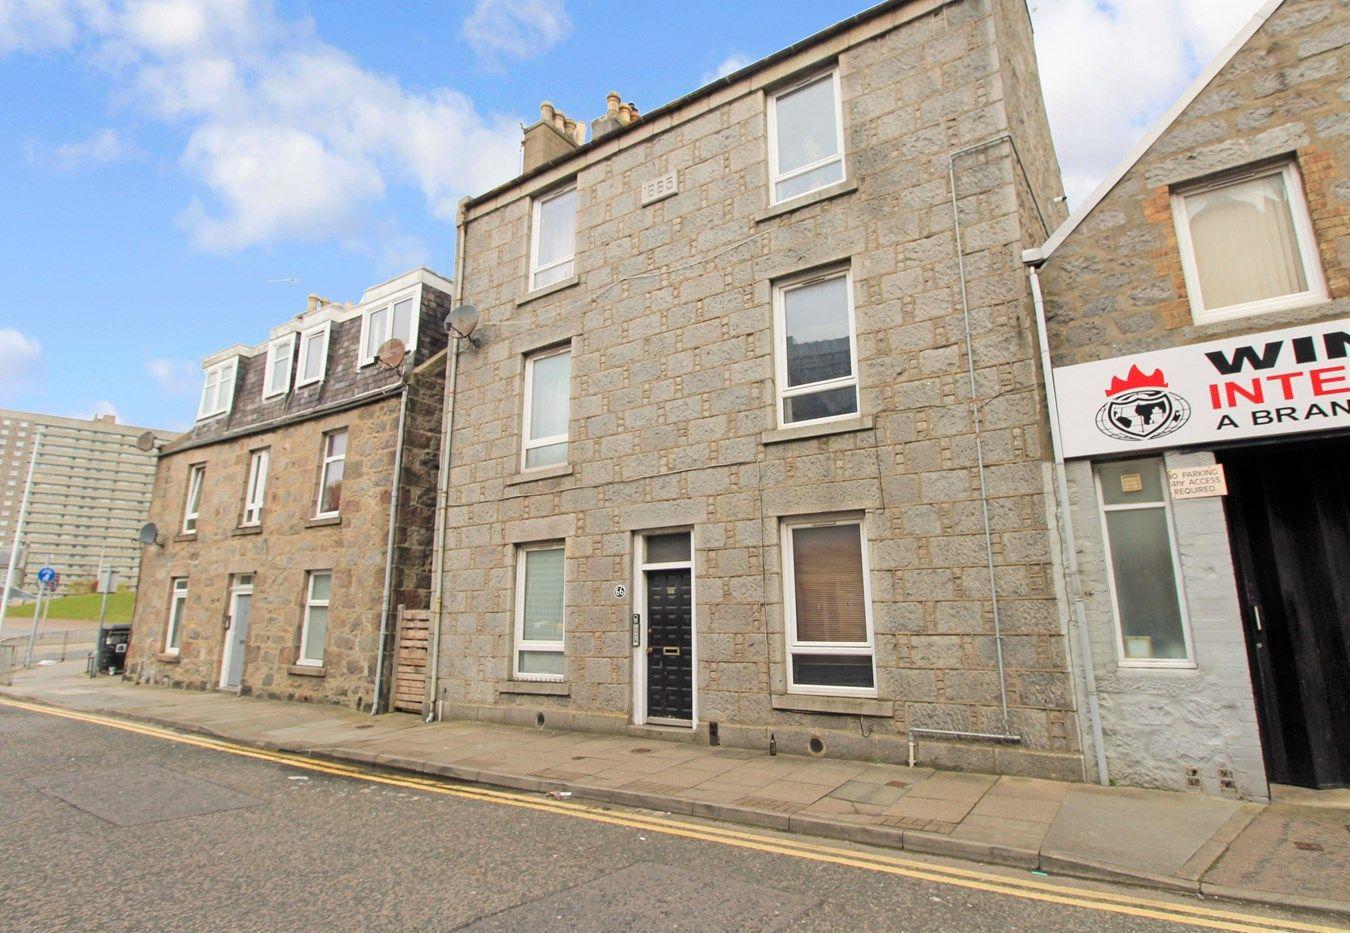 Property photo 1 of 18.